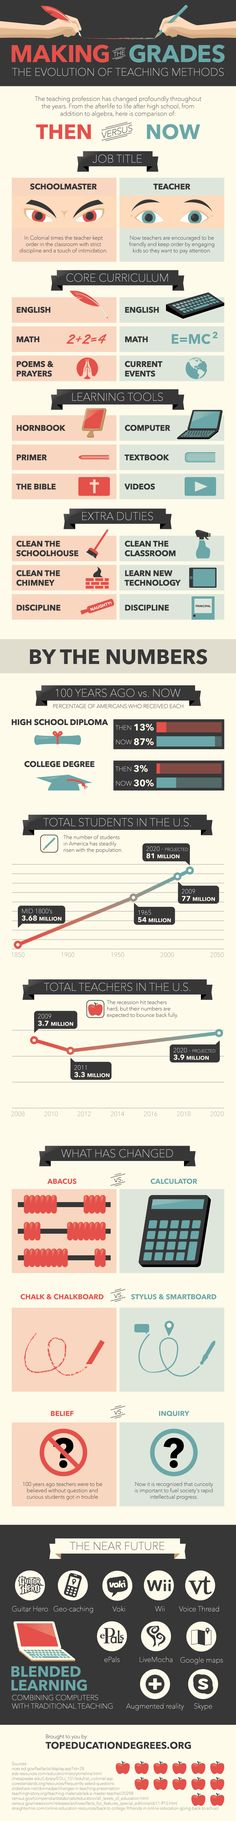 Making the Grades: The Evolution of Teaching Methods